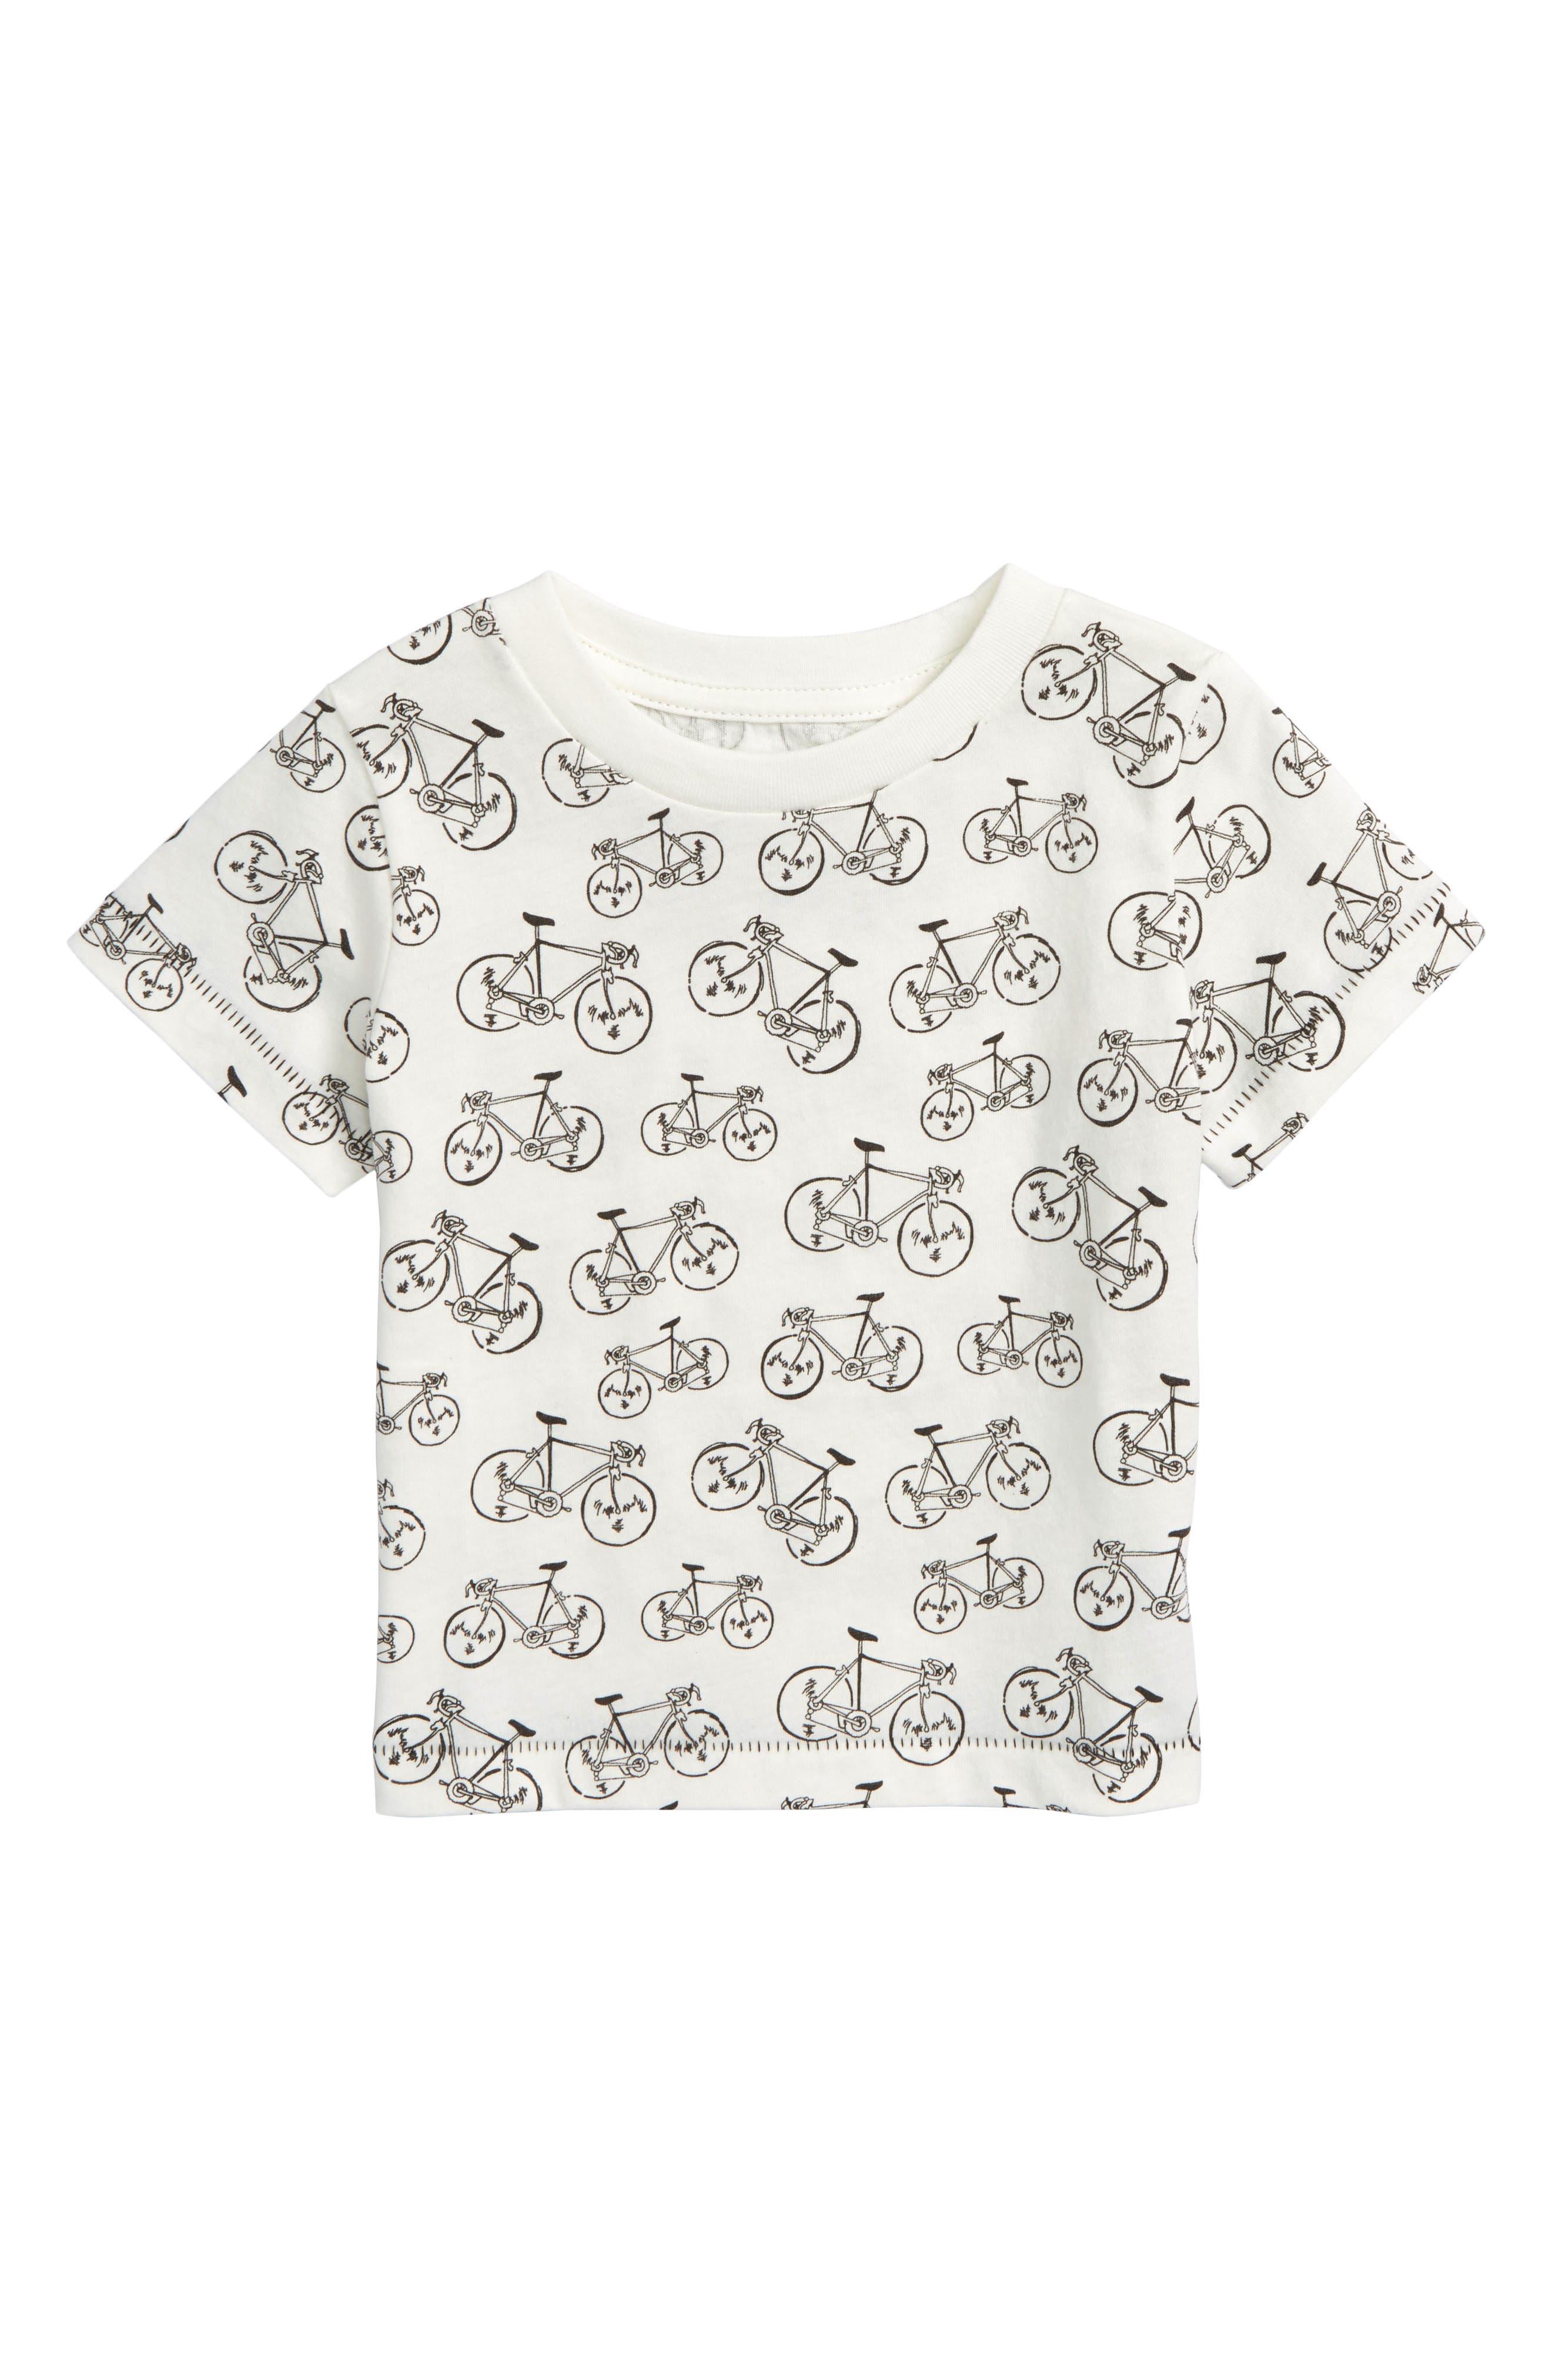 Peek Allover Bike Graphic T-Shirt (Baby Boys)